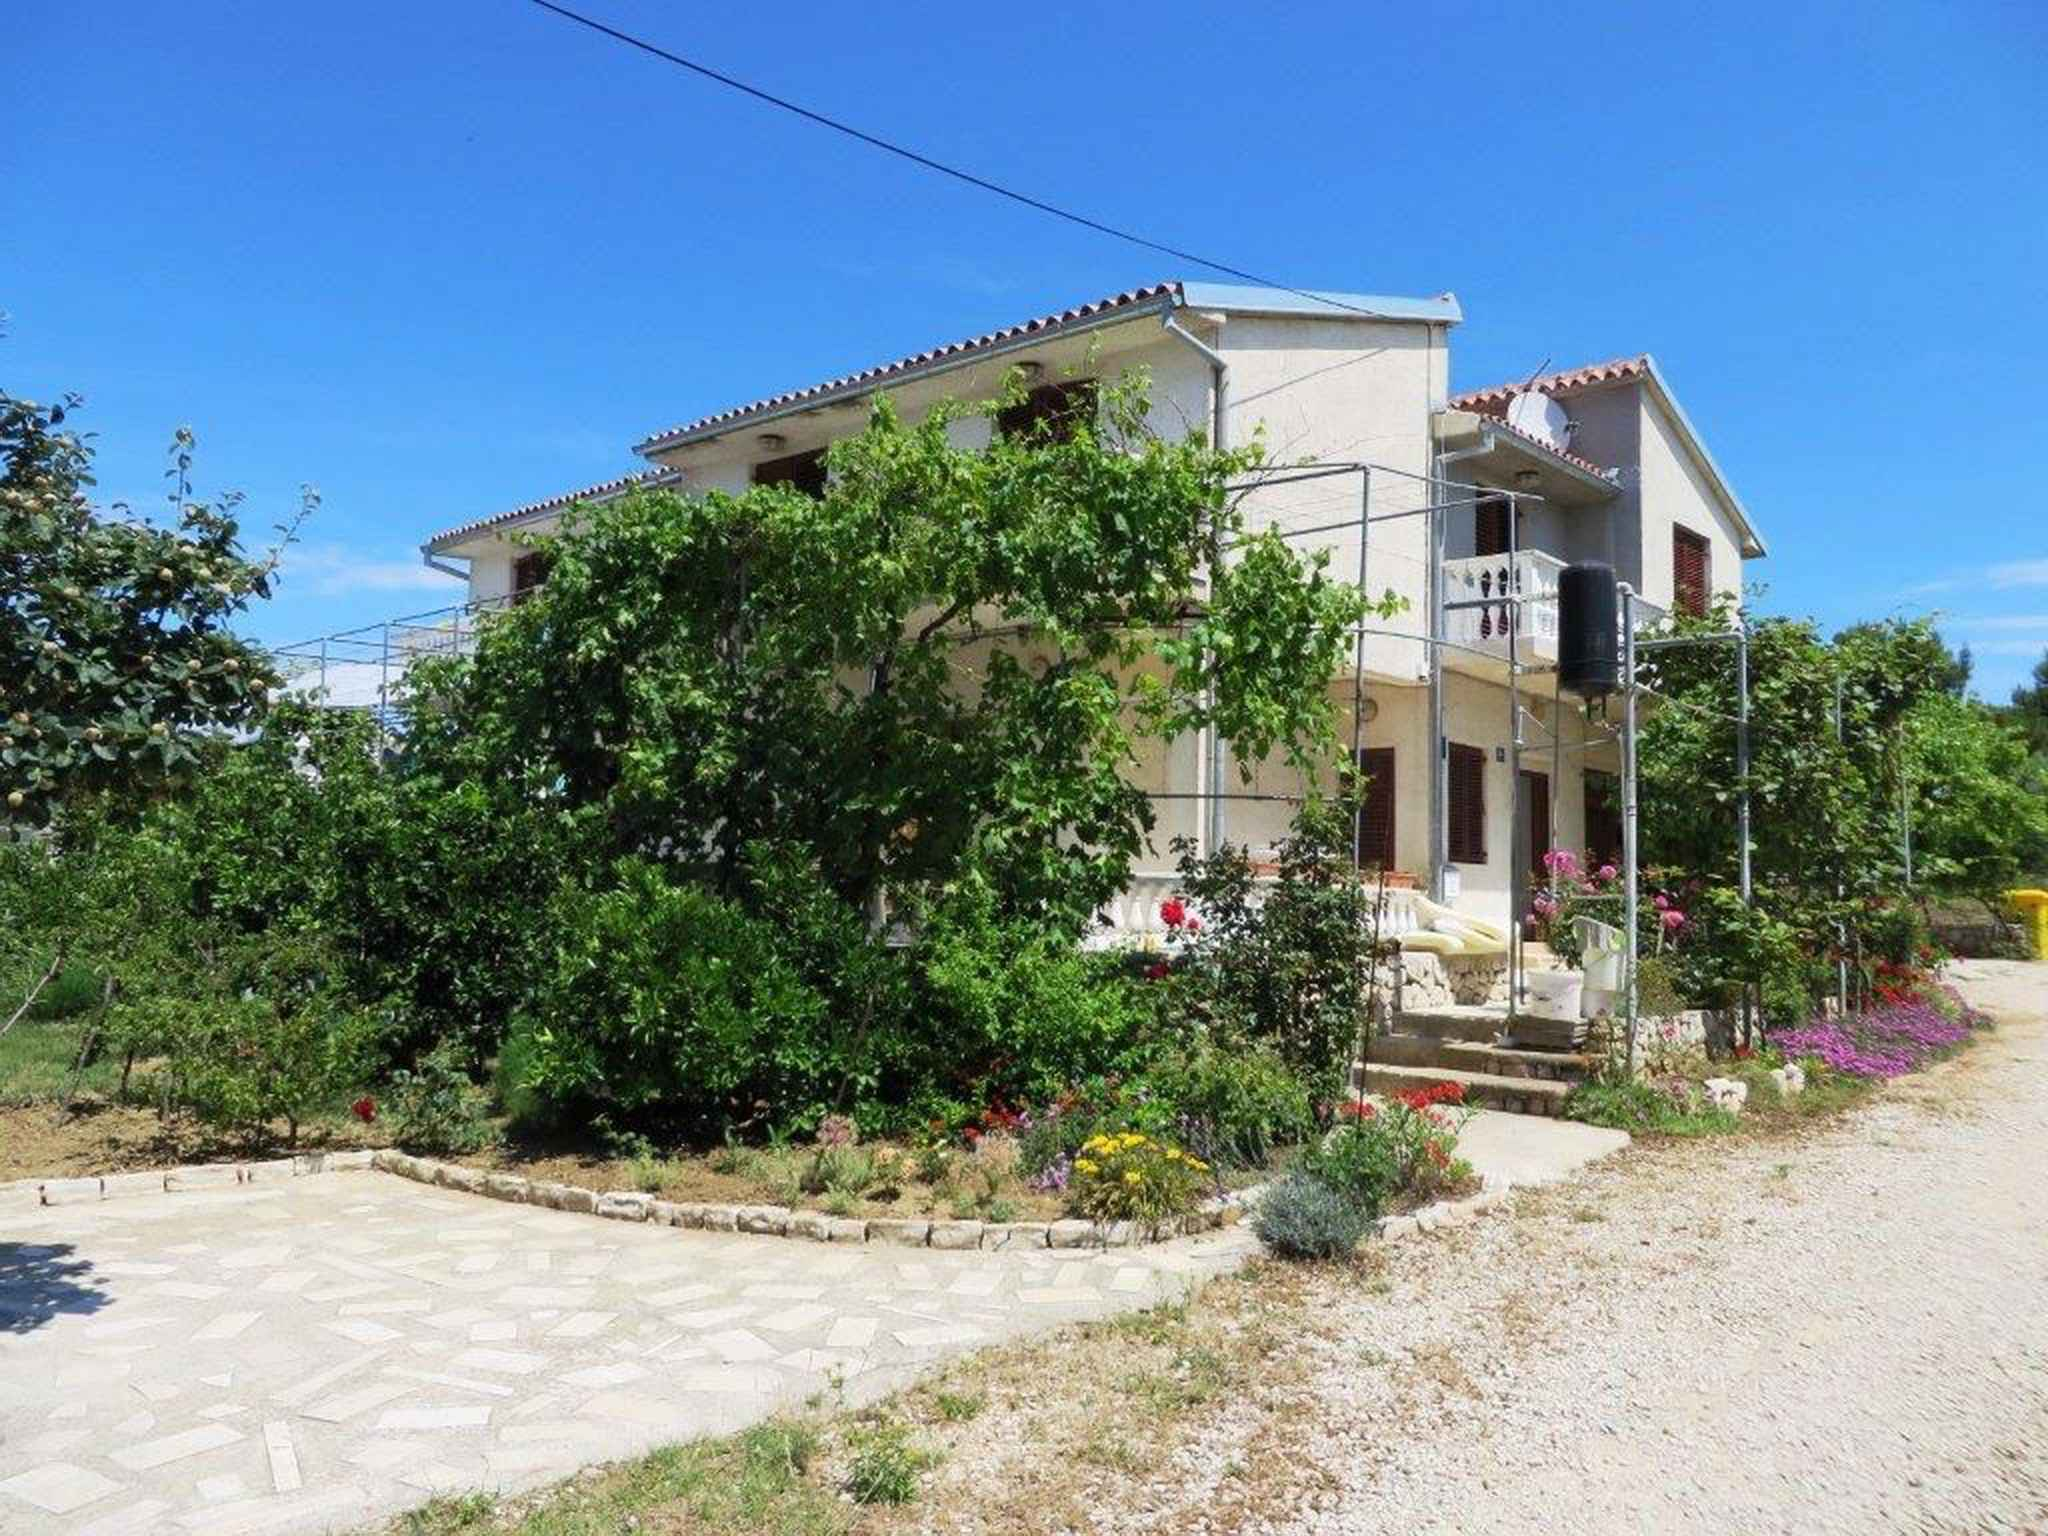 Ferienhaus samo 80 metara od Jadranskog mora (325274), Vrsi, , Dalmatien, Kroatien, Bild 1